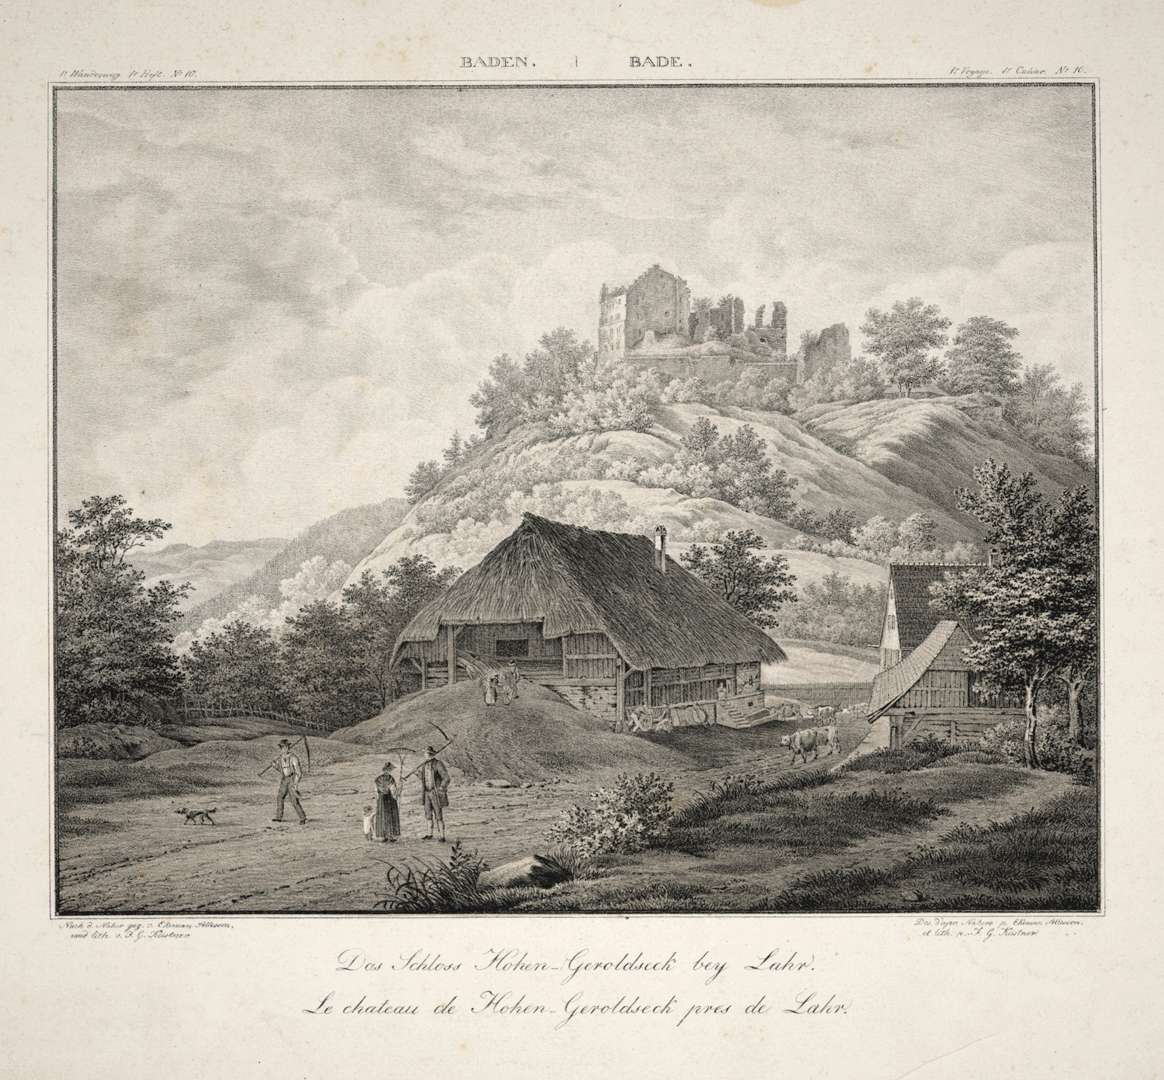 Das Schloß Hohen-Geroldseck bey Lahr, le Chateau de Hohen-Geroldseck pres de Lahr, Bild 1